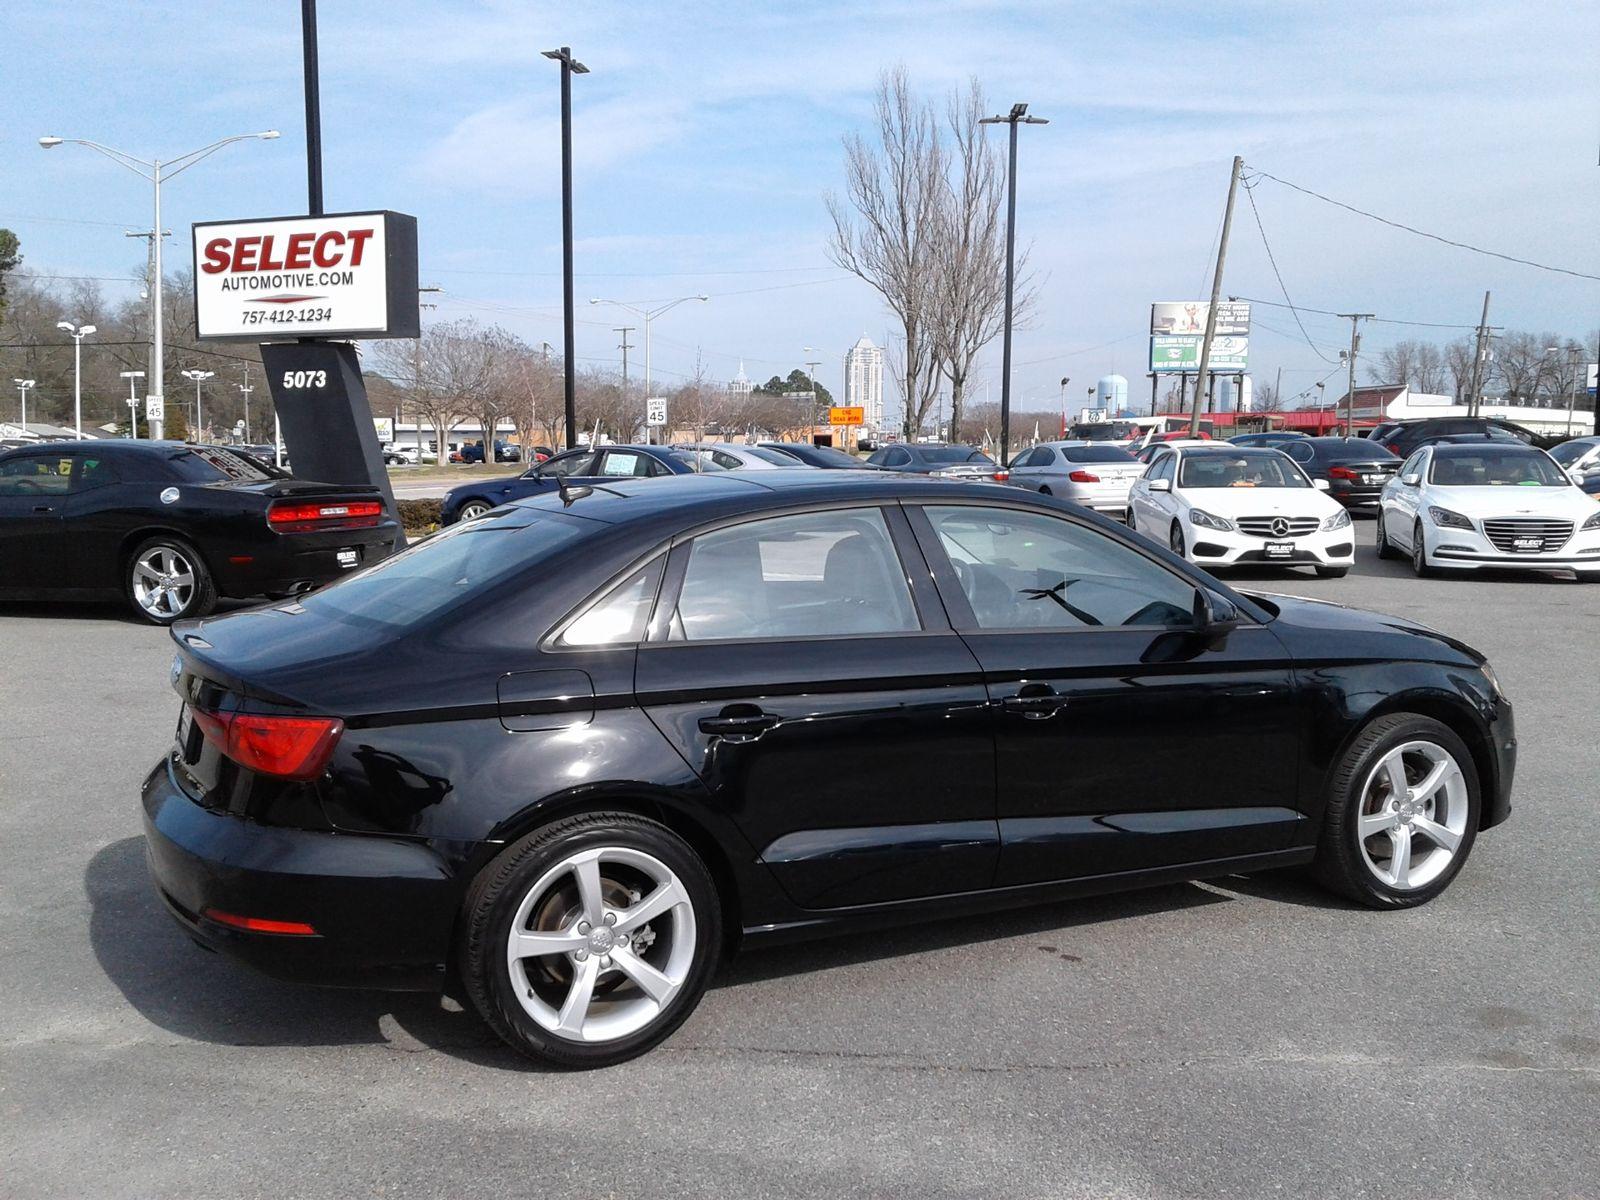 2015 Audi A3 Premium Turbo city Virginia Select Automotive VA